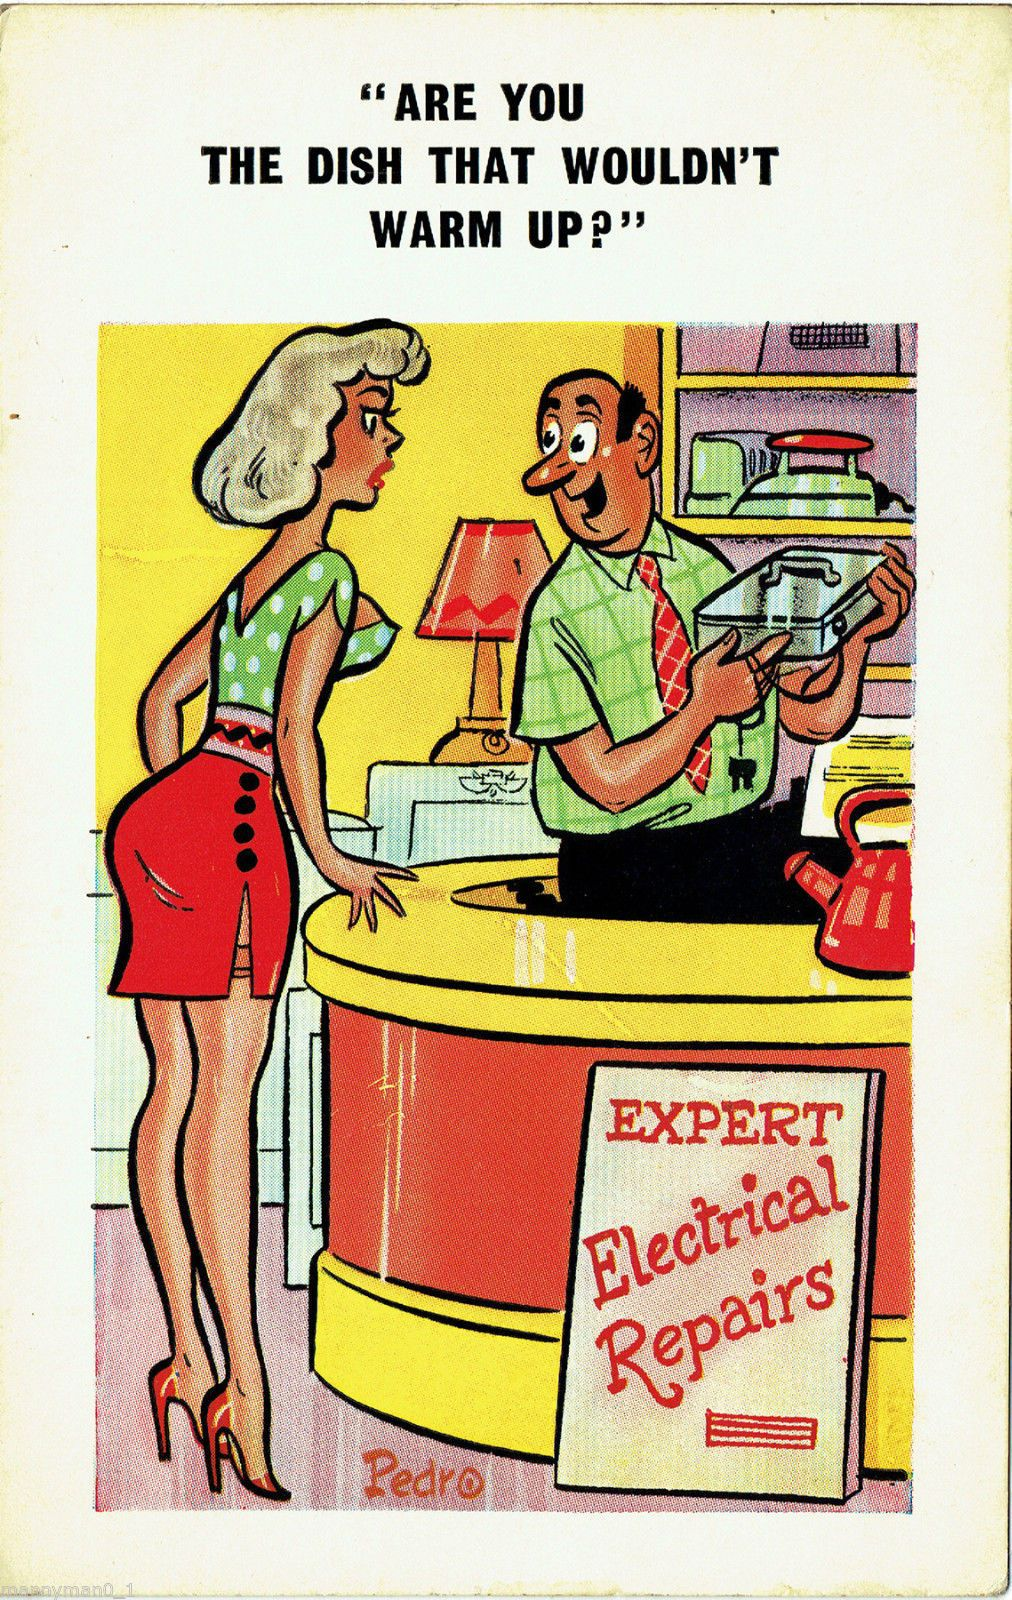 1950s adult humor